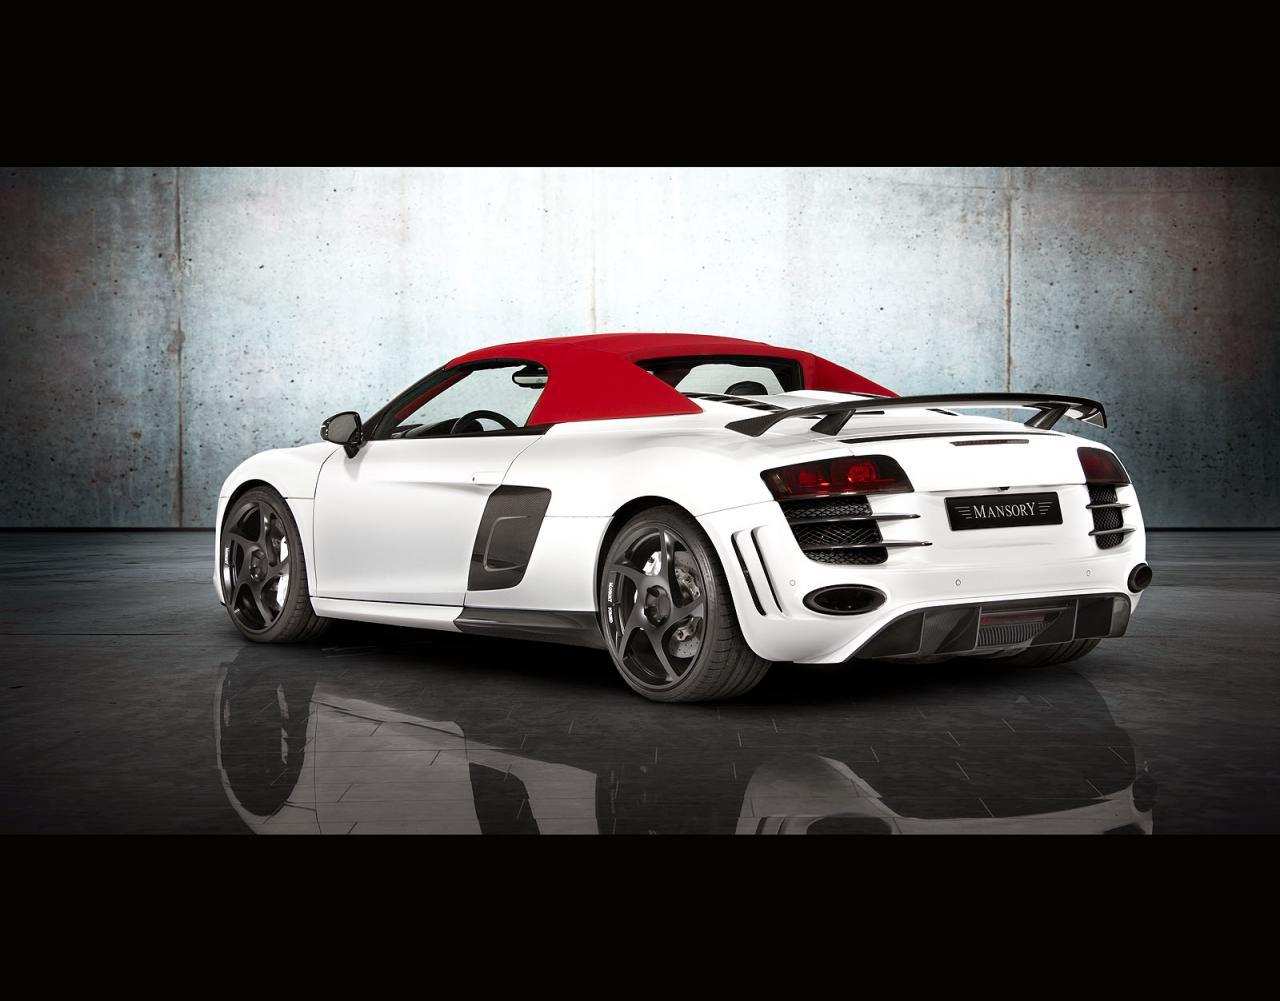 Mansory Audi R V Spyder Autoevolution - Audi r8 v10 spyder